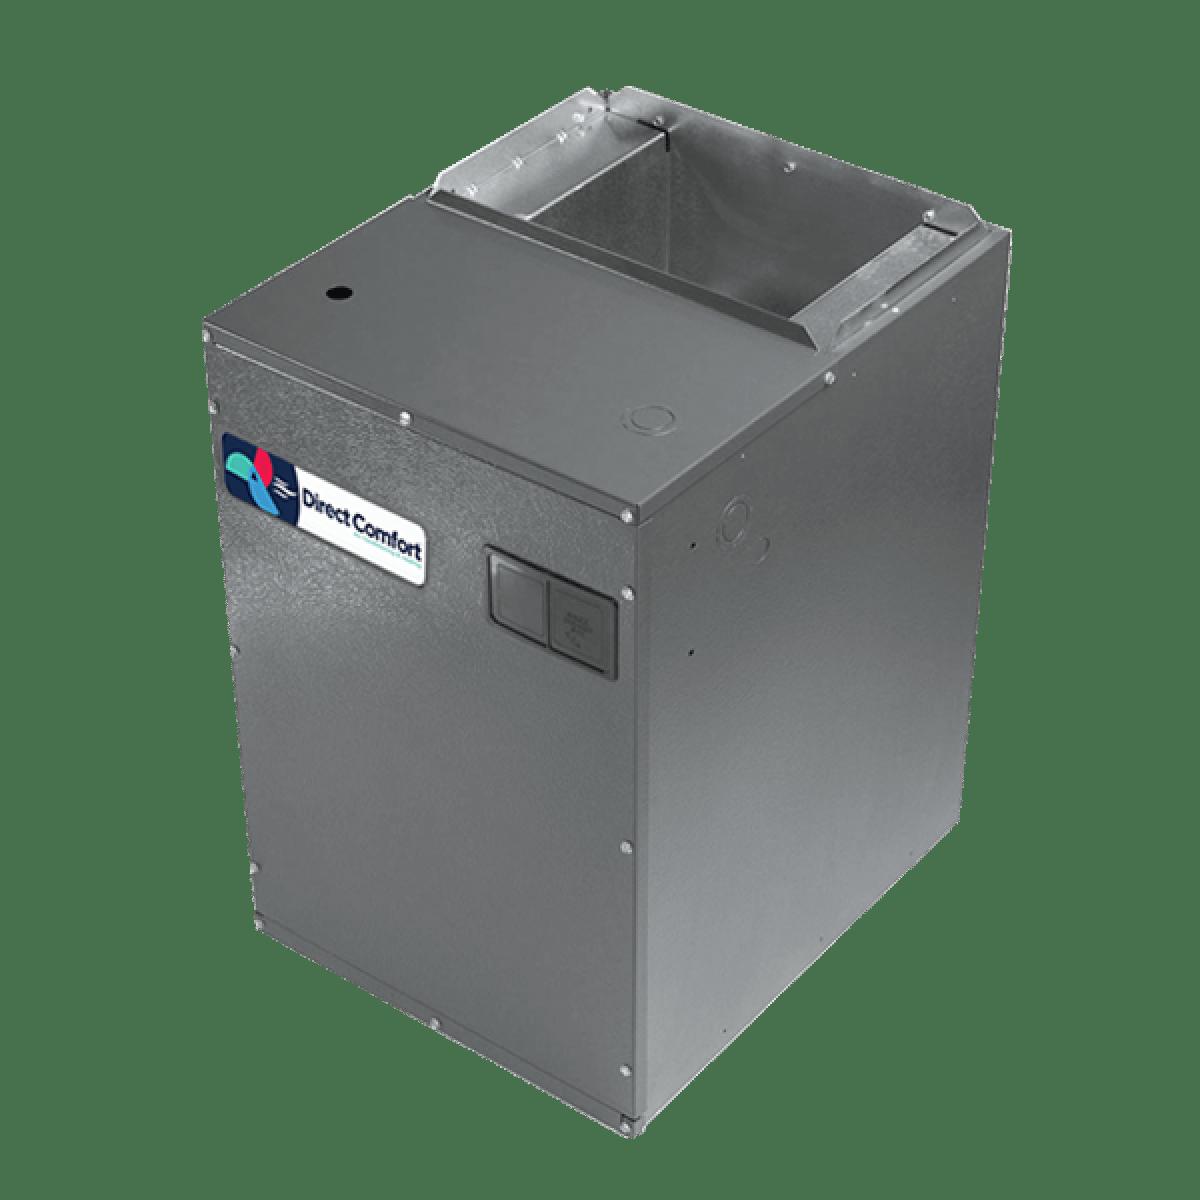 Direct Comfort MBVC1200 CFM Variable